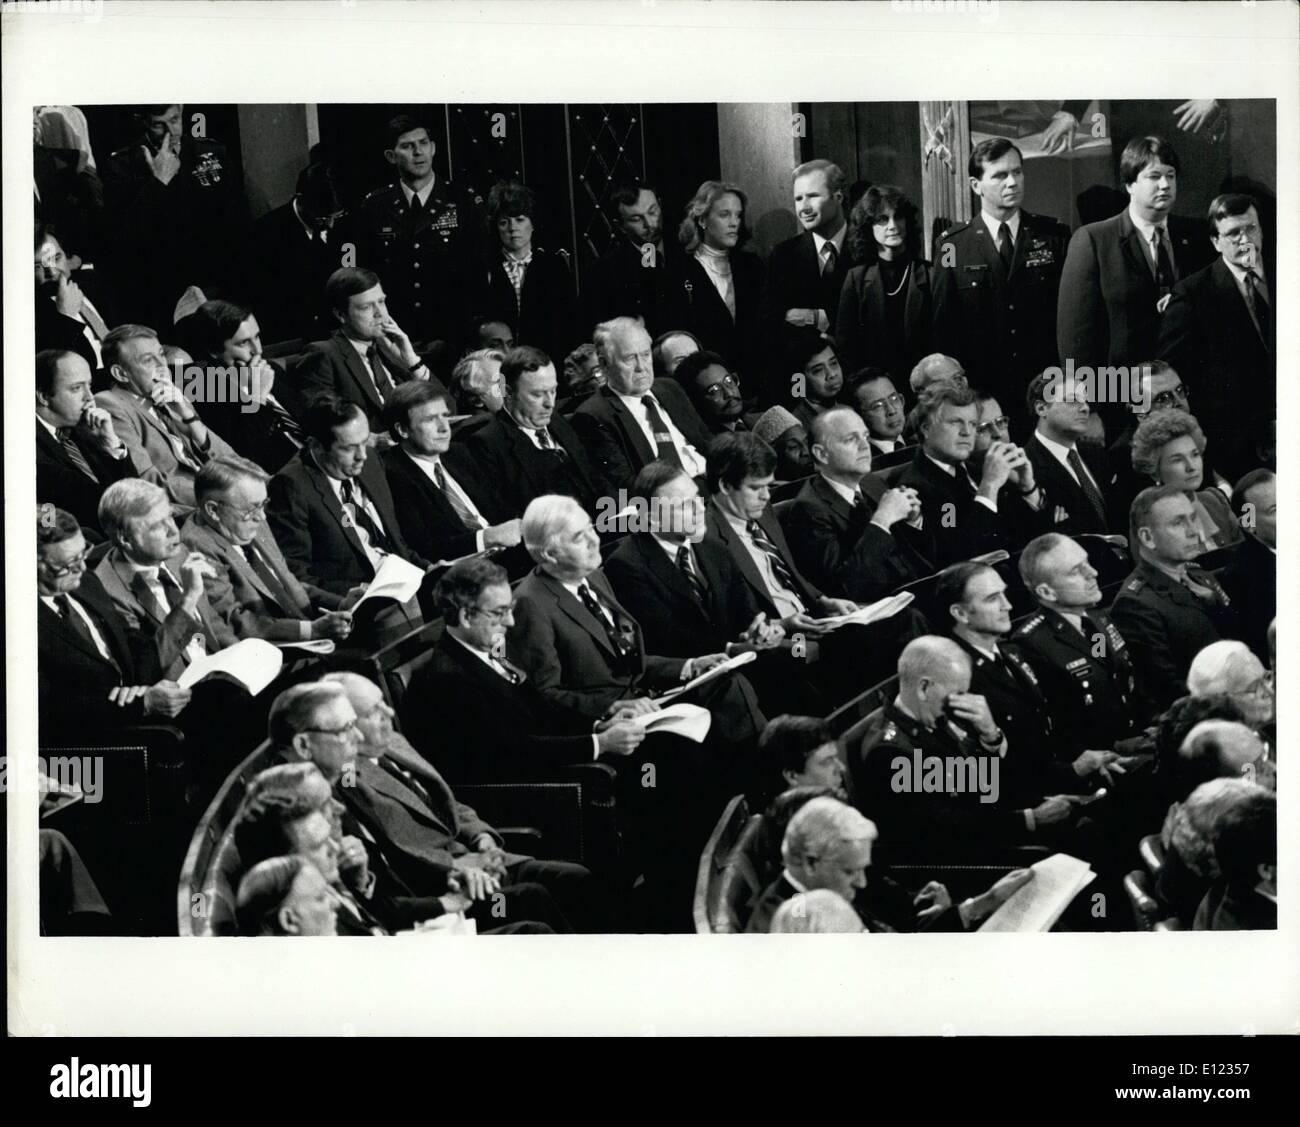 Jan. 01, 1984 - Democrats Listen: Washington, D.C. Democratic Senators are shown as they listen to President Reagan - Stock Image